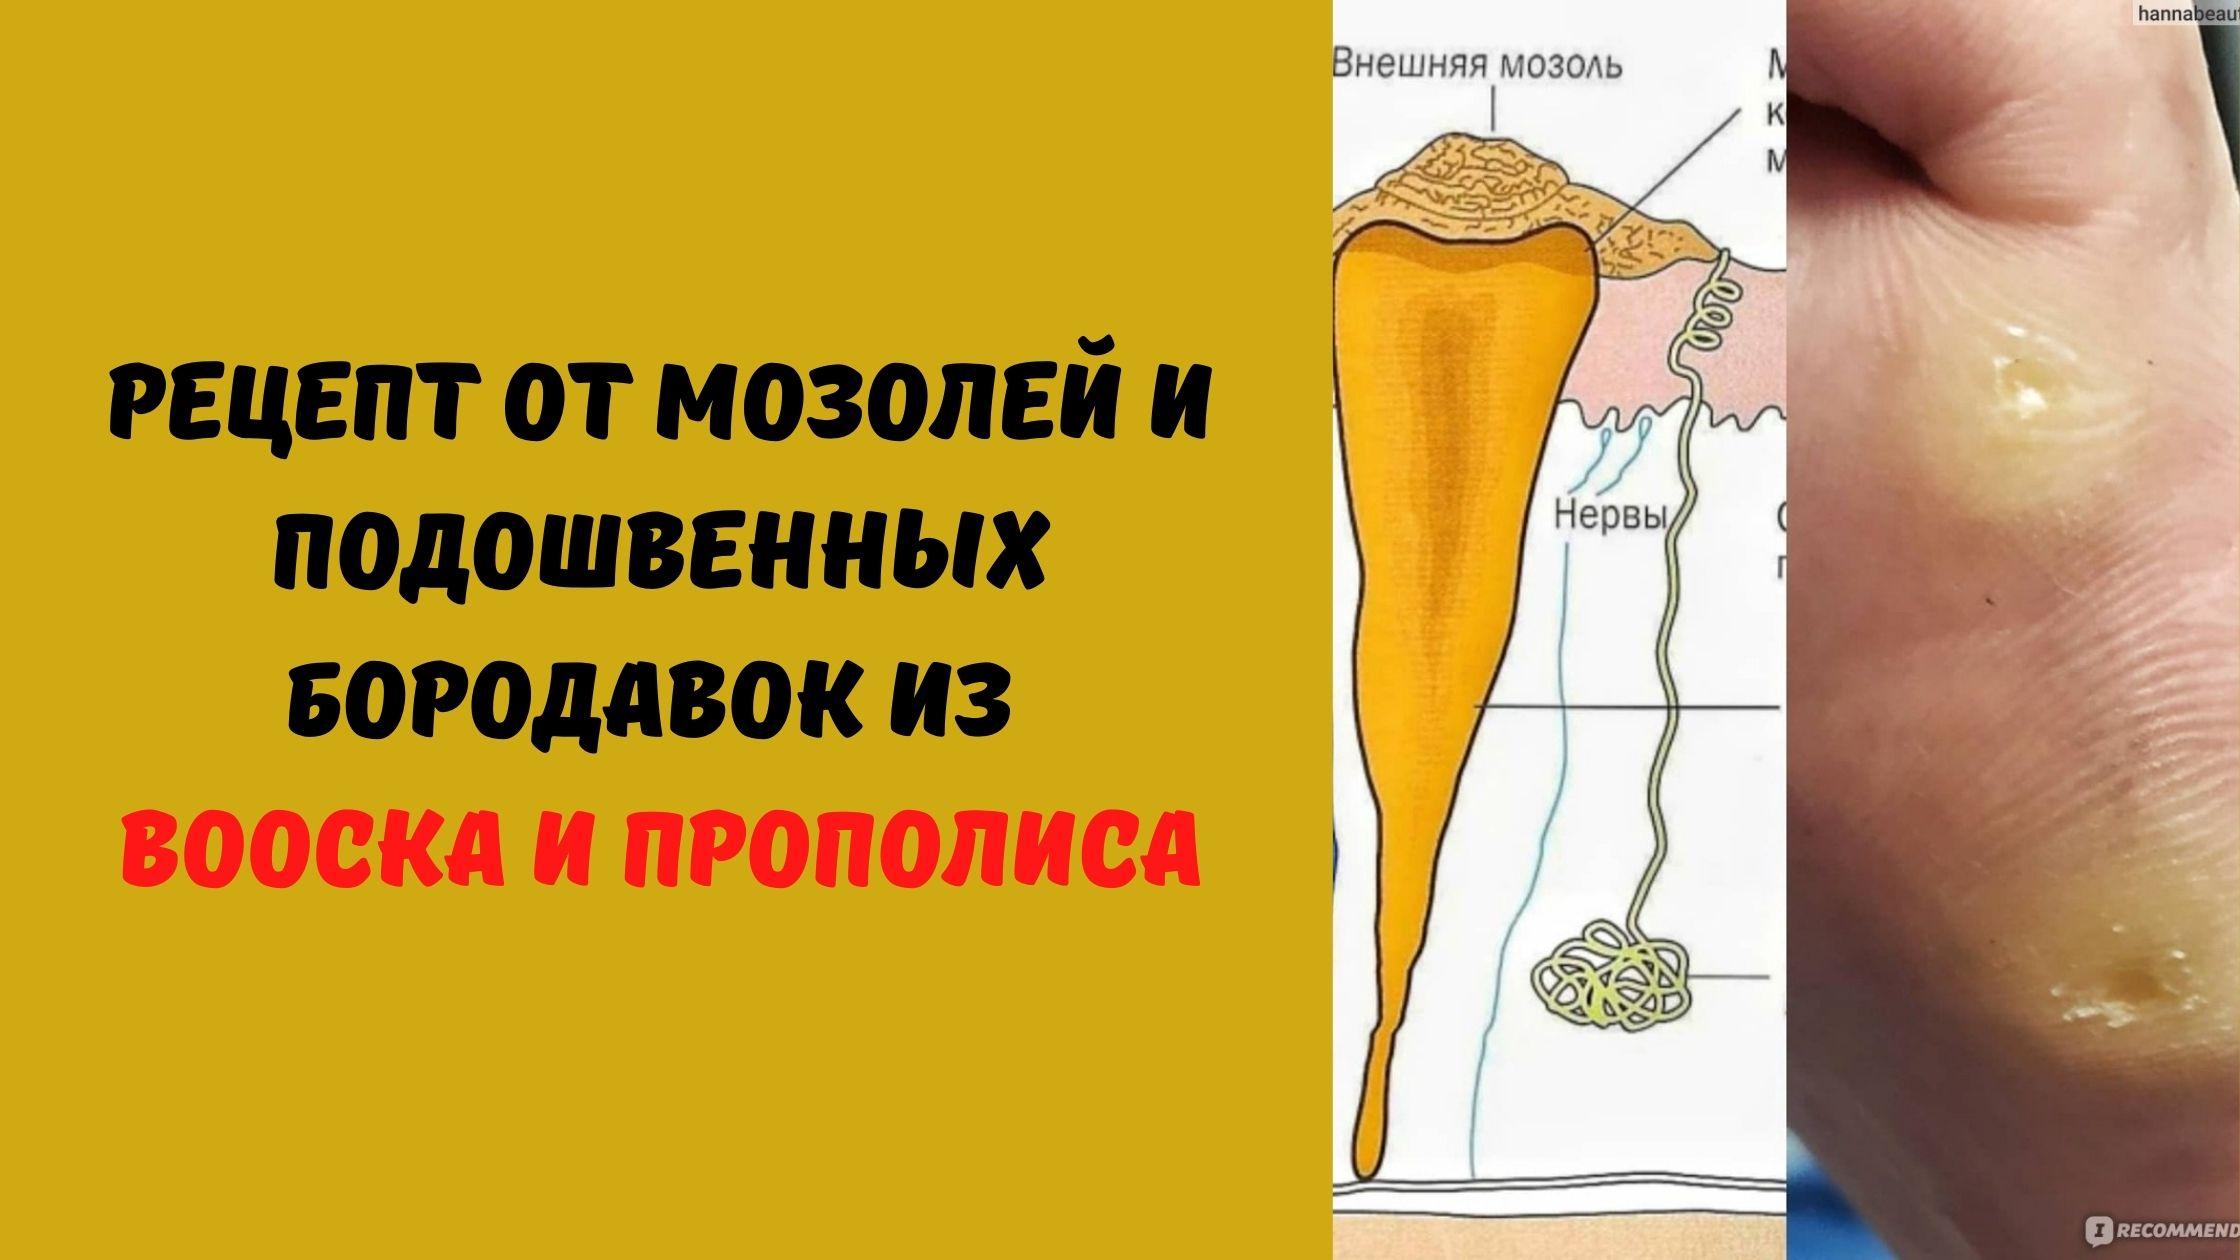 рецепт от мозолей и бородавок